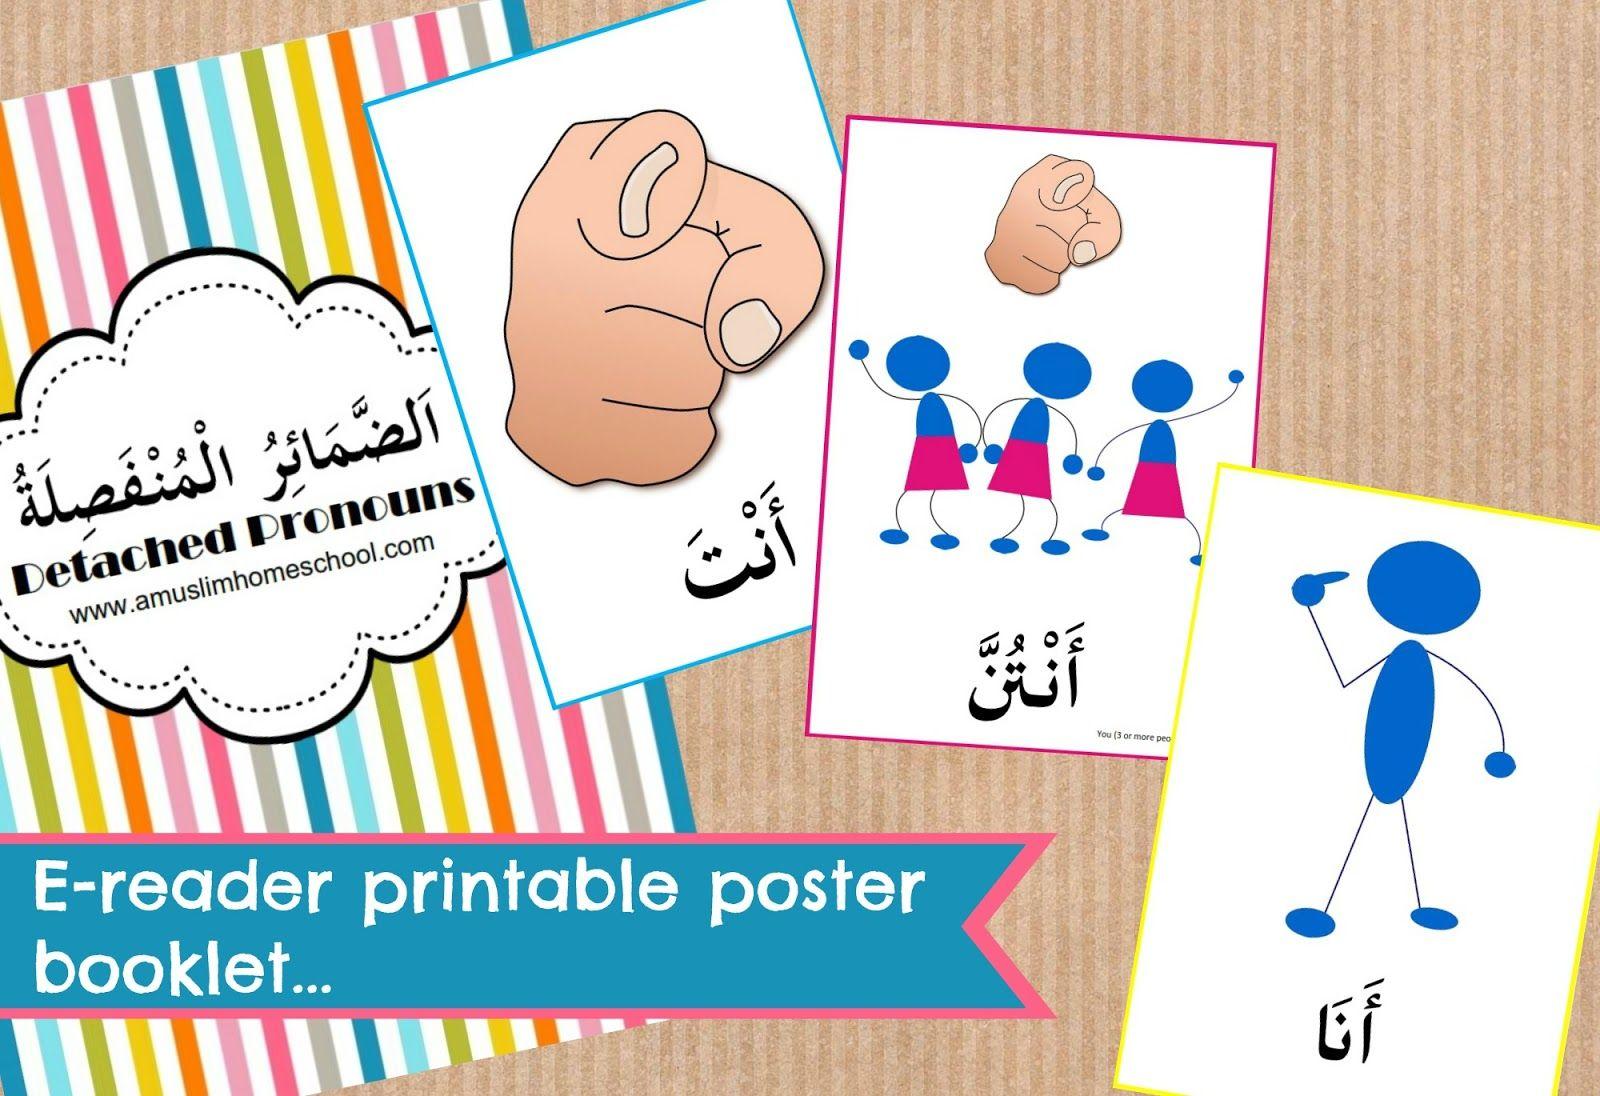 Arabic Detached Pronouns Poster Book Arabic Kids Muslim Kids Activities Learning Arabic